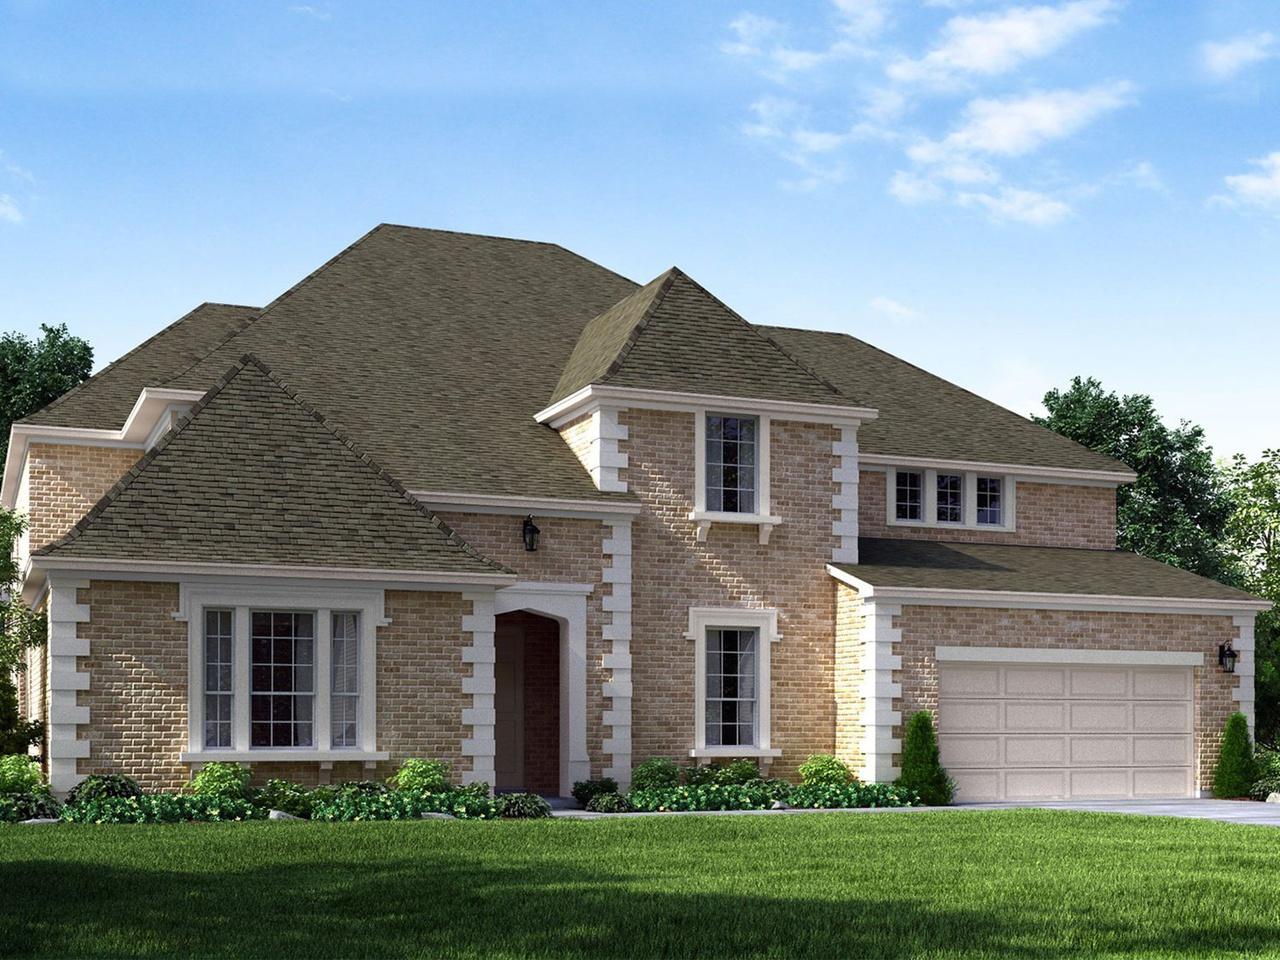 1611 Wichita Dr, Prosper, TX 75078 | MLS# 1338086 | Redfin